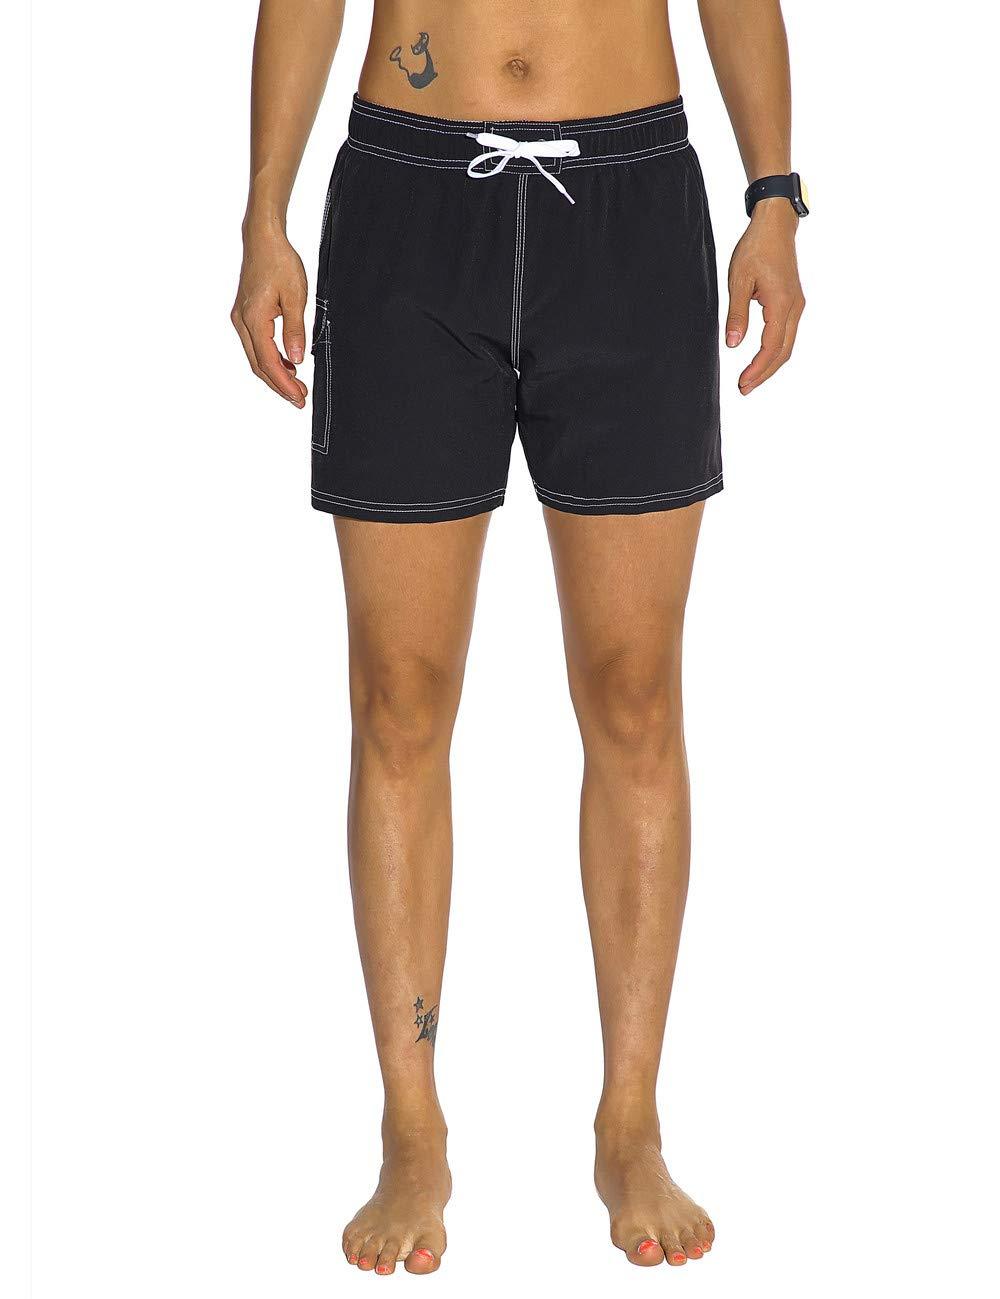 Nonwe Womens Swim Trunks Quick Dry Solid Summer Beach Shorts Mesh Lining